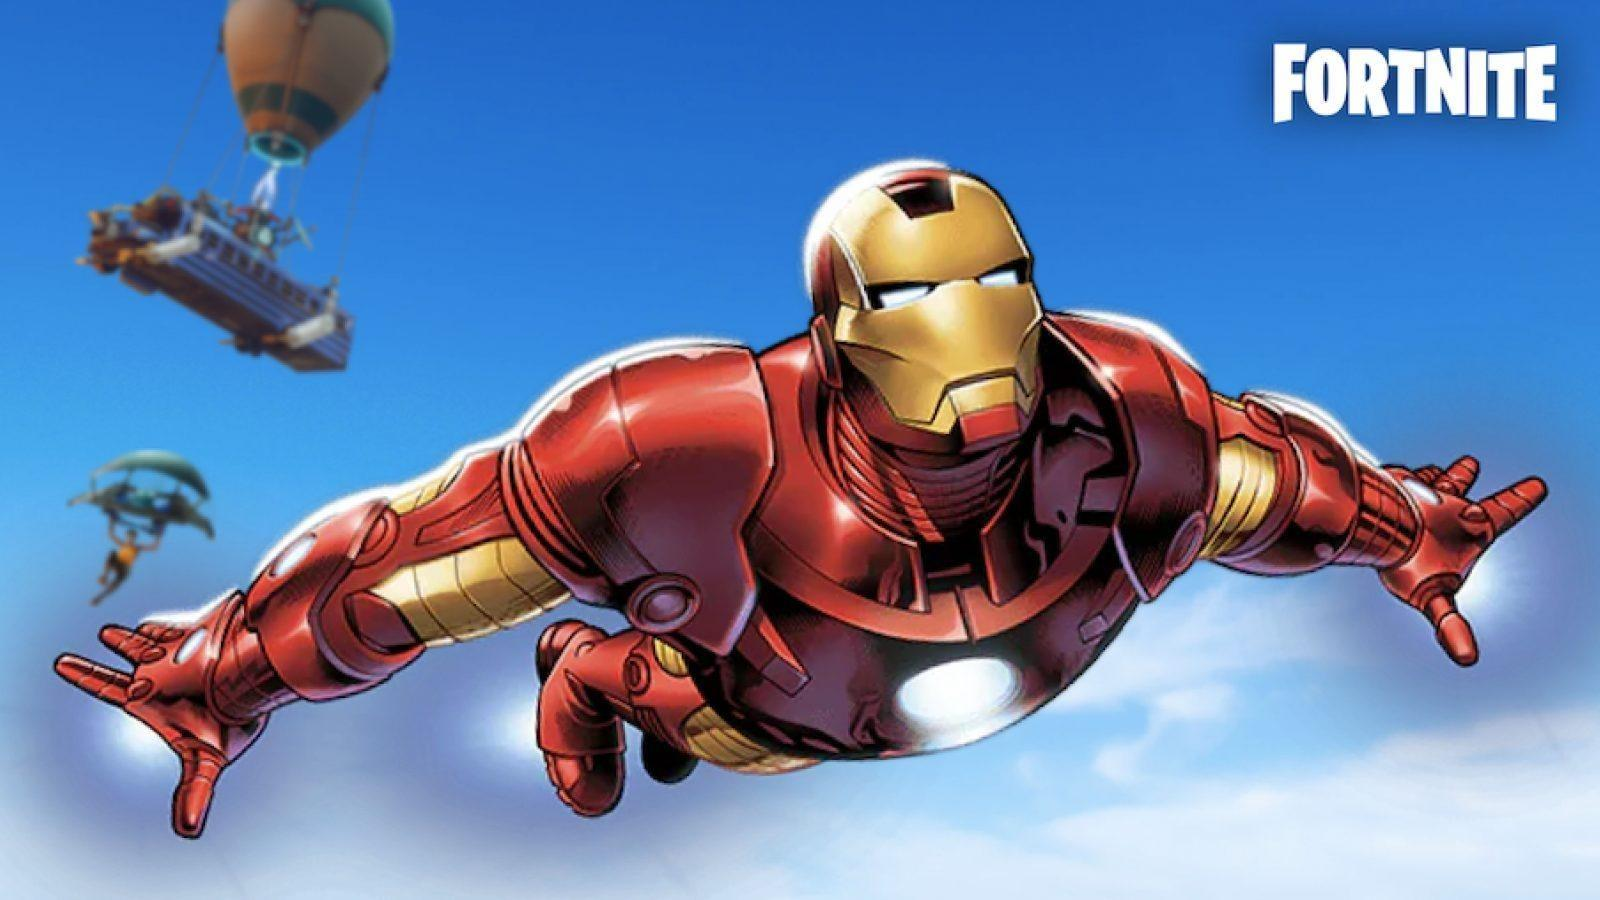 Iron Man Fortnite Wallpapers Wallpaper Cave